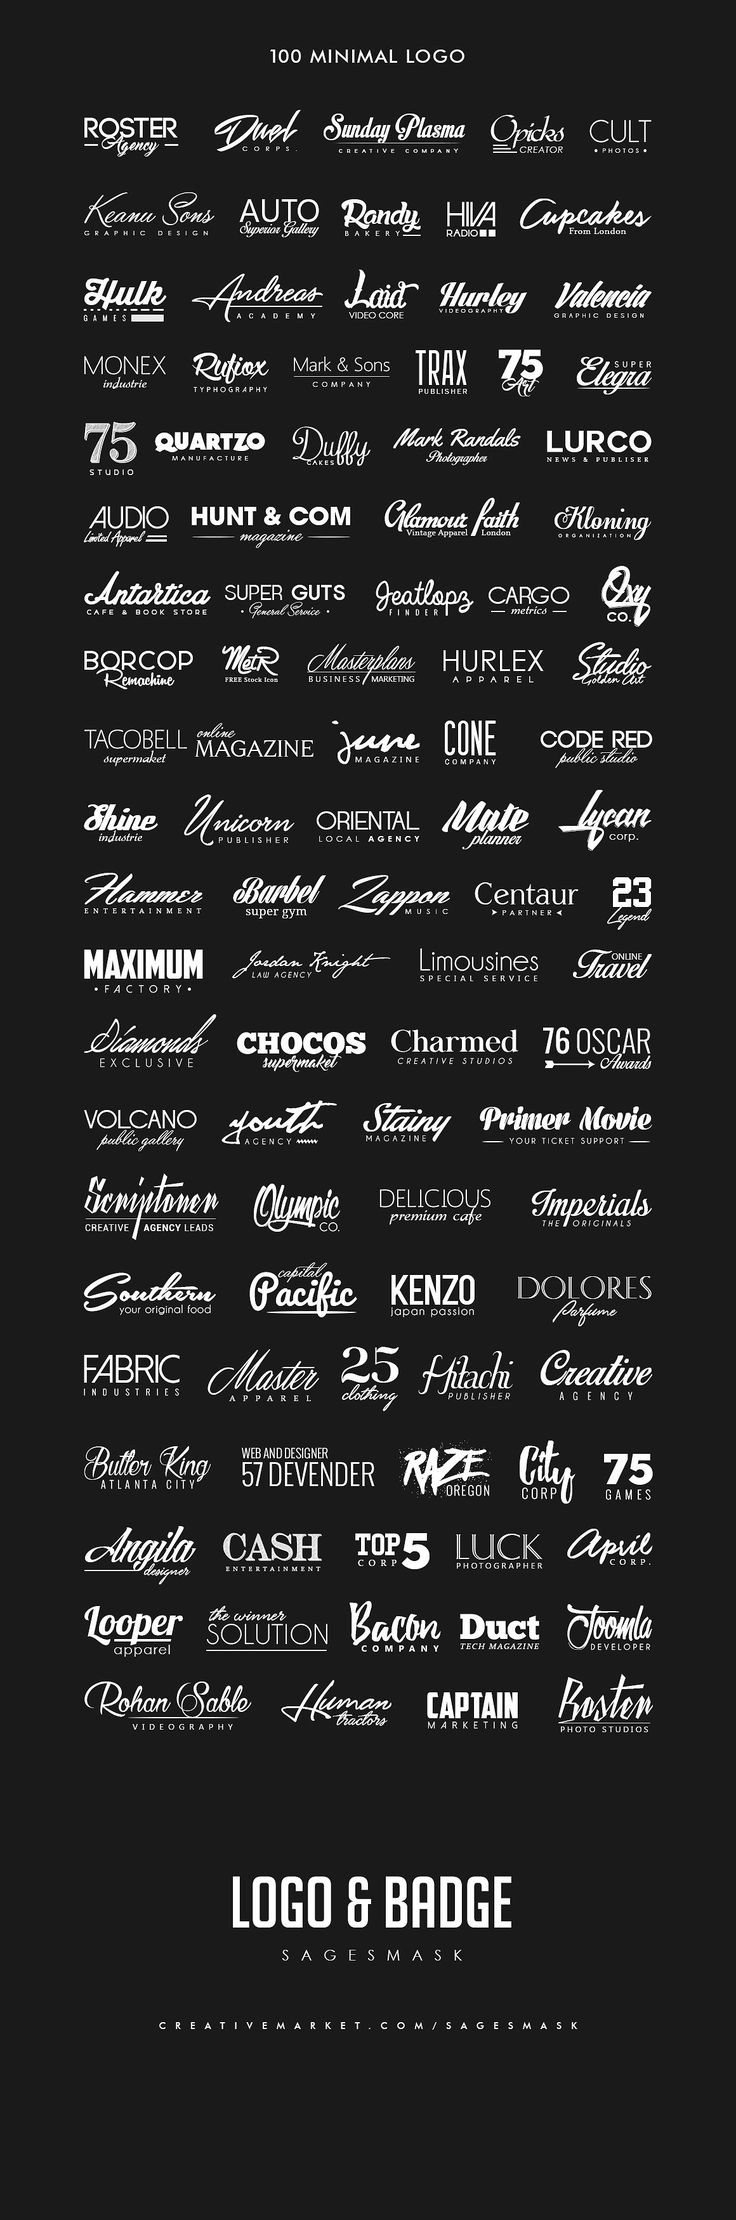 400 Minimal Logo by sagesmask on @creativemarket